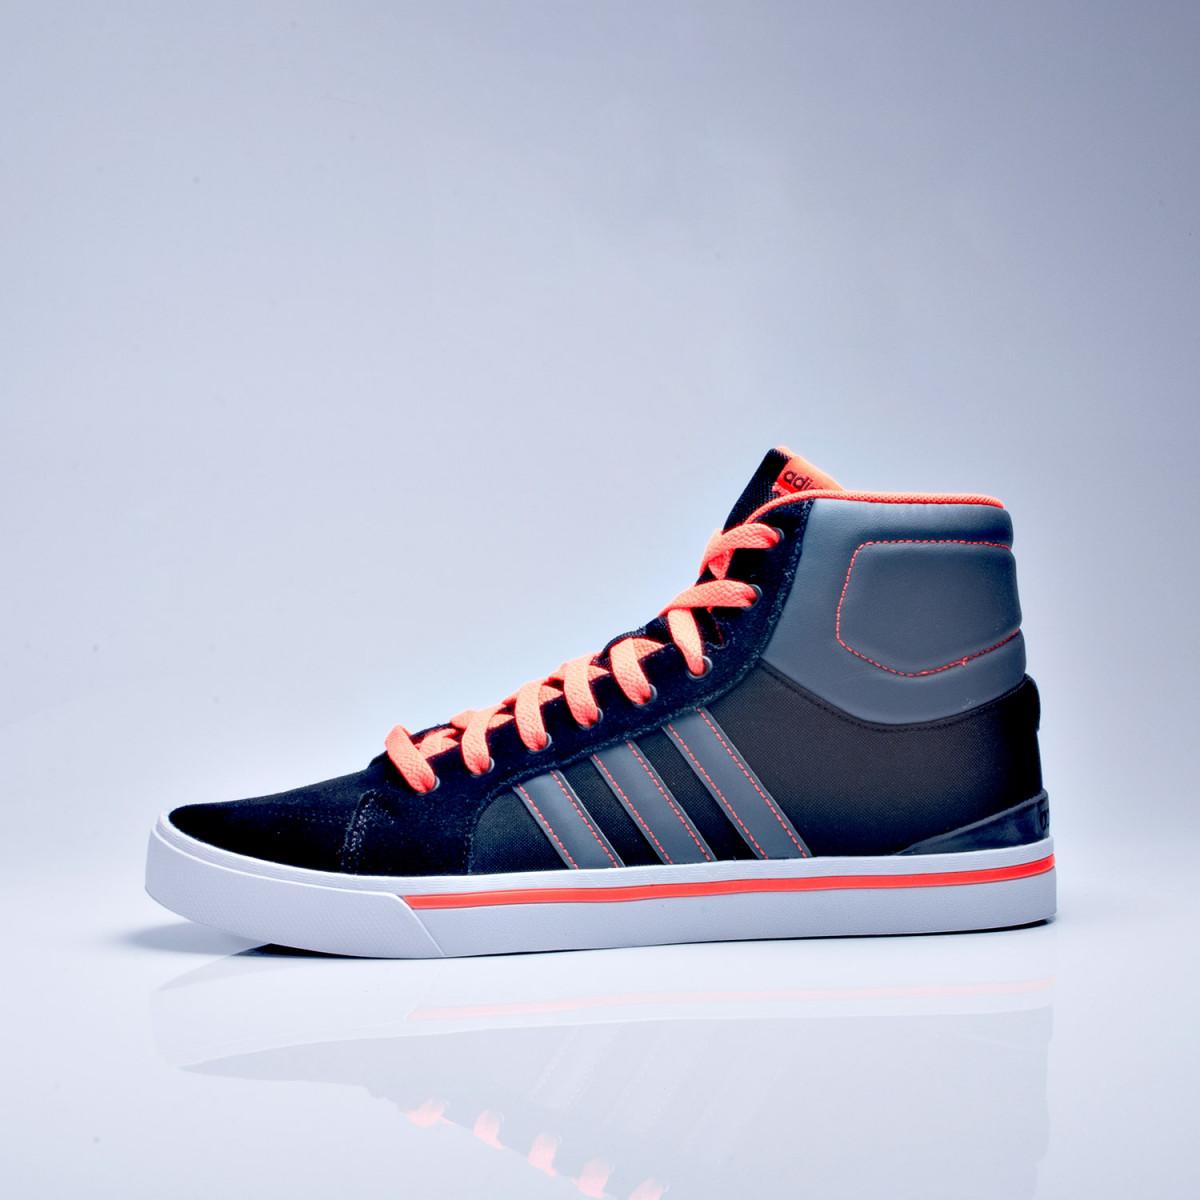 Zapatillas Adidas Neo Park St Mid